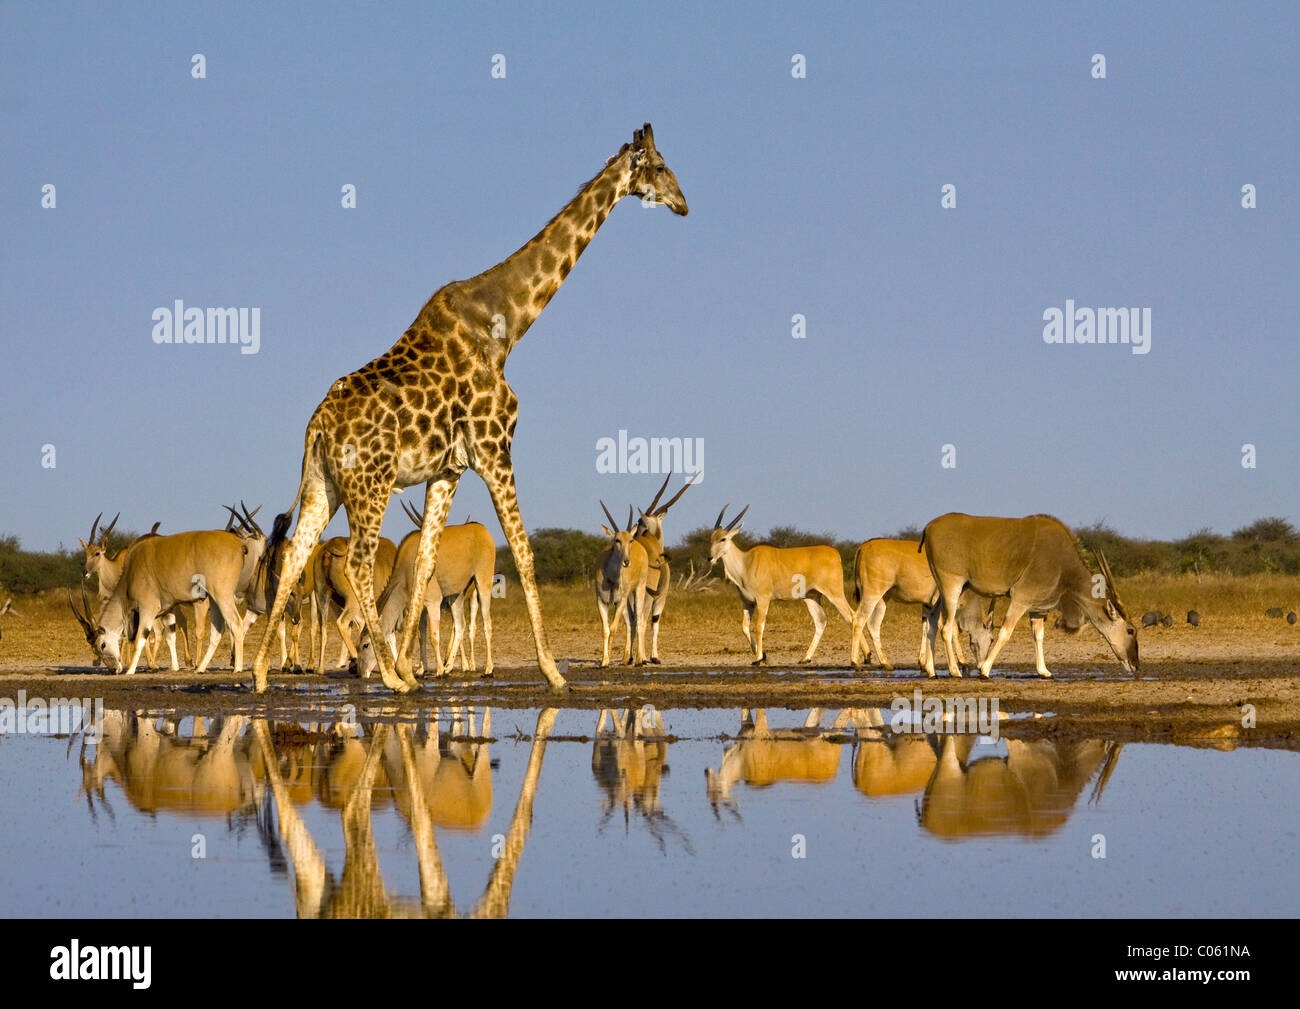 Jirafa y Eland en waterhole, Parque Nacional de Etosha, en Namibia. Imagen De Stock